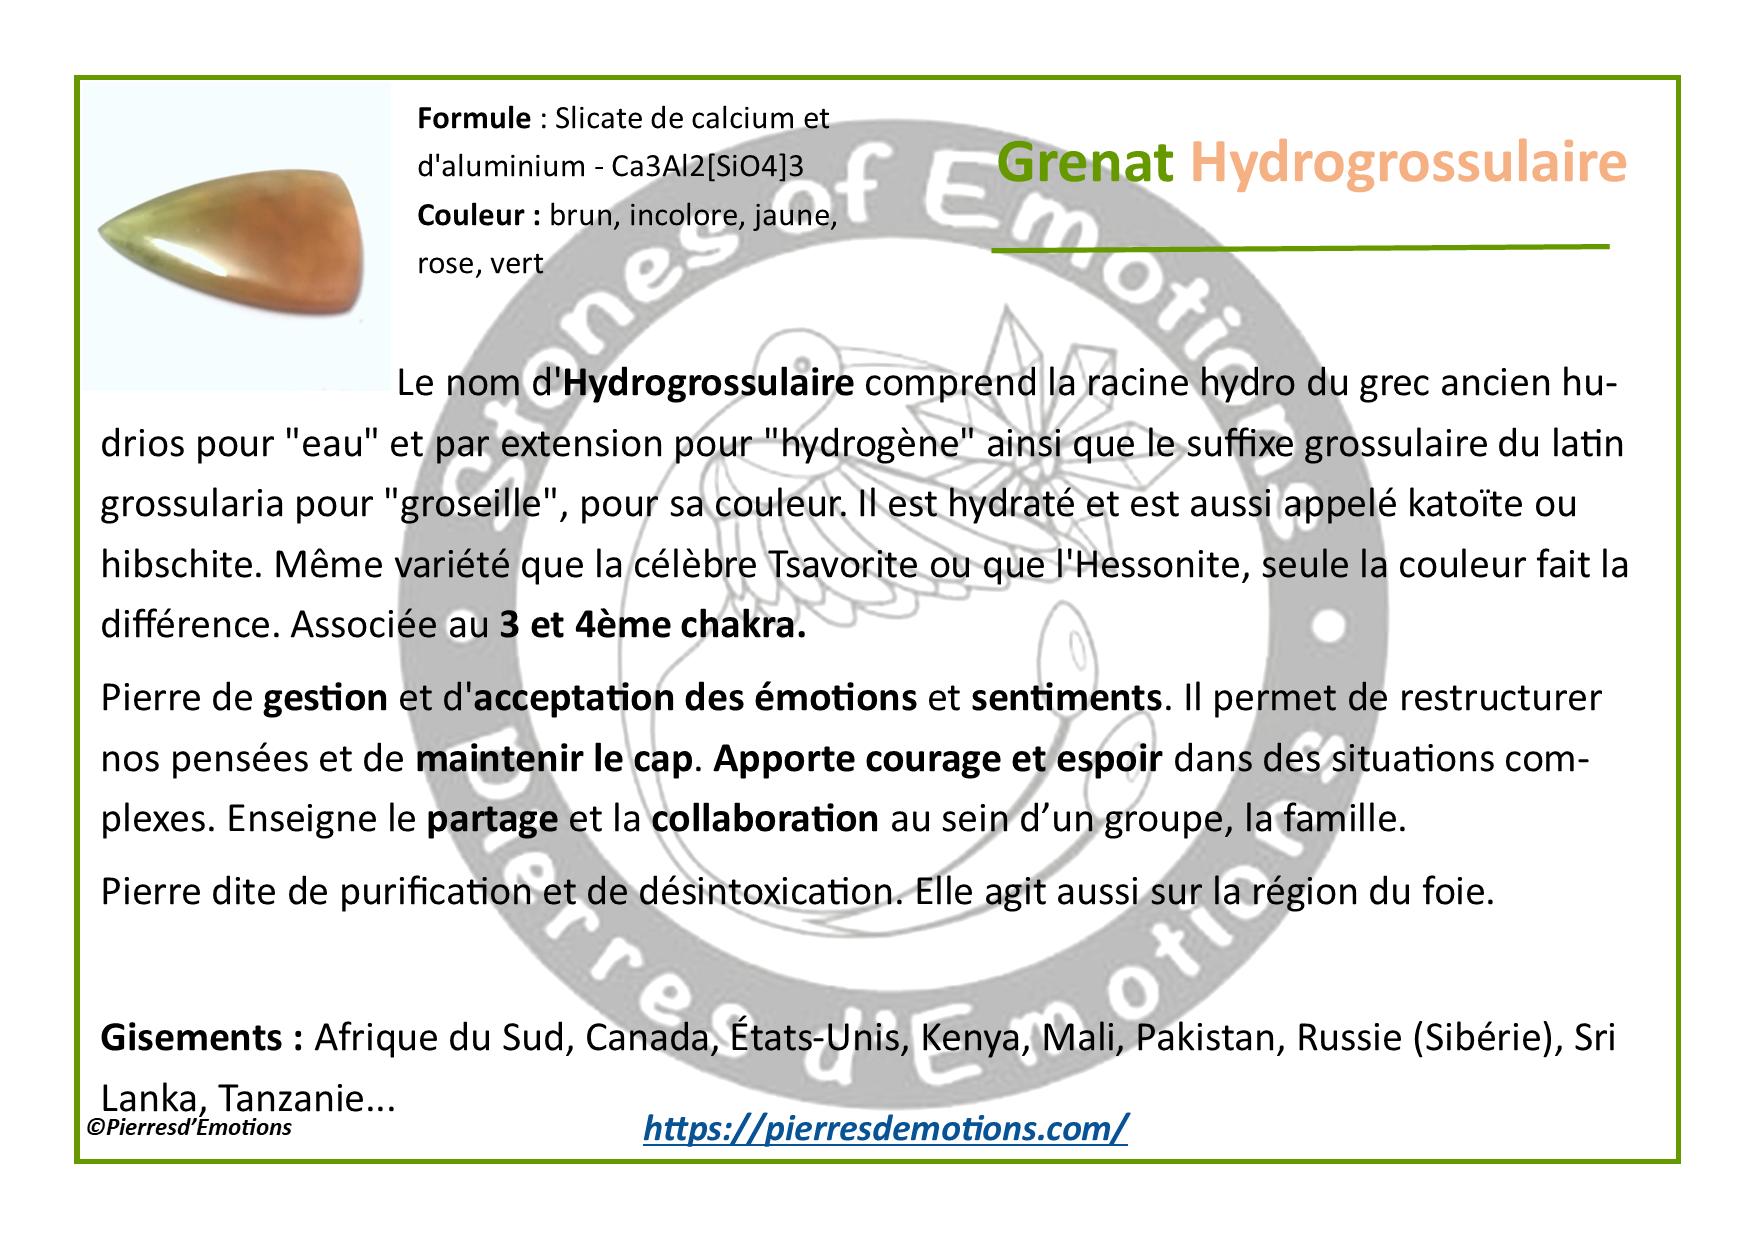 GrenatHydrogrossulaire